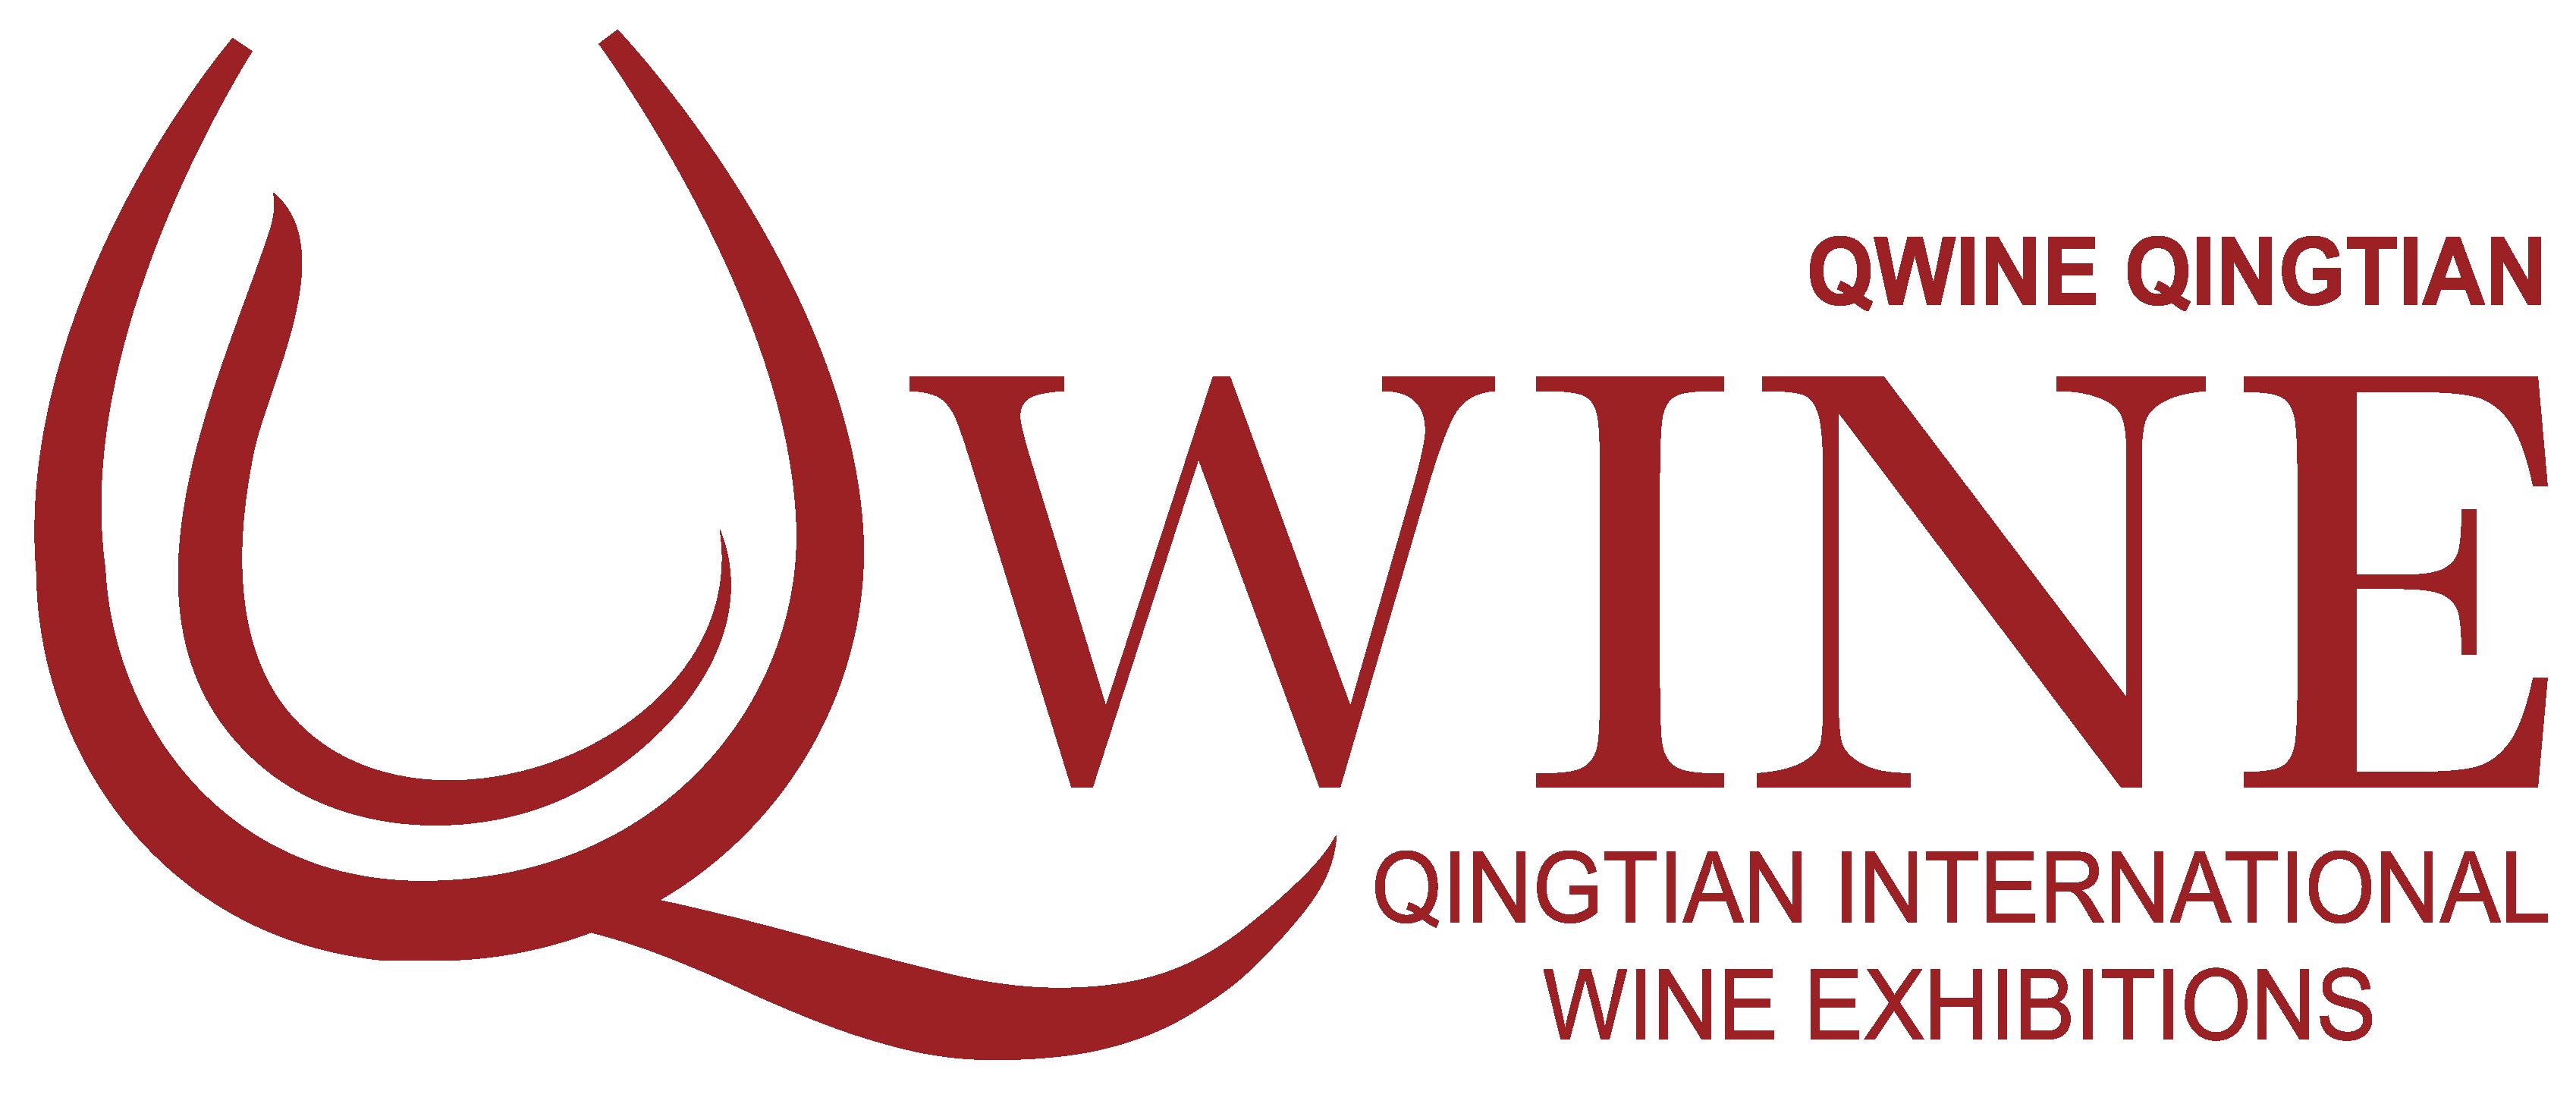 Qwine Expo Qingtian